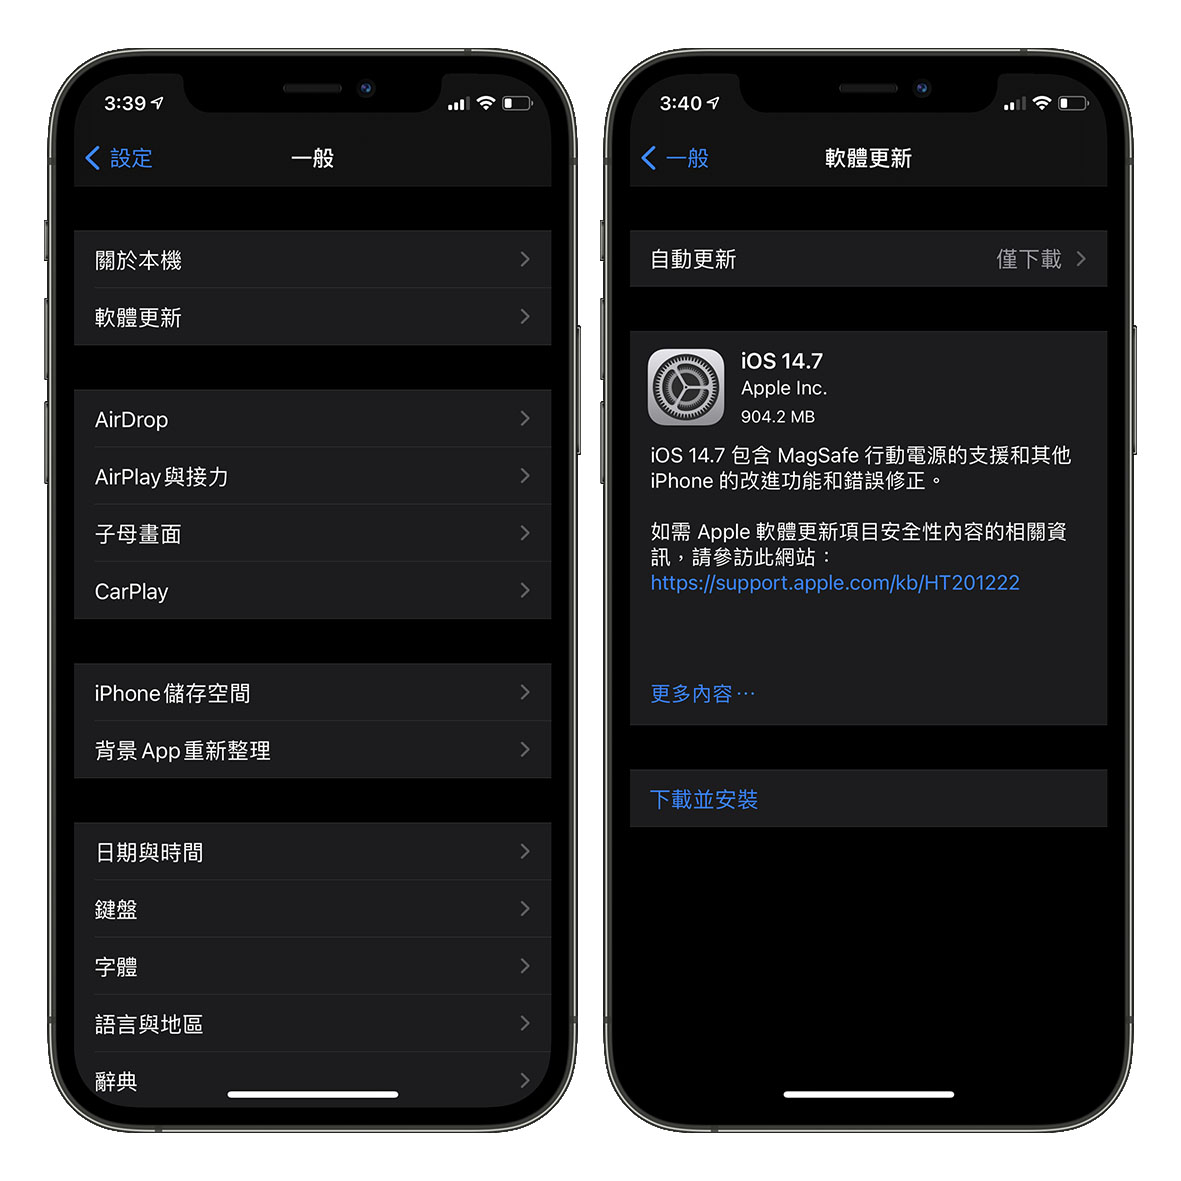 iOS 14.7、Apple、iPhone